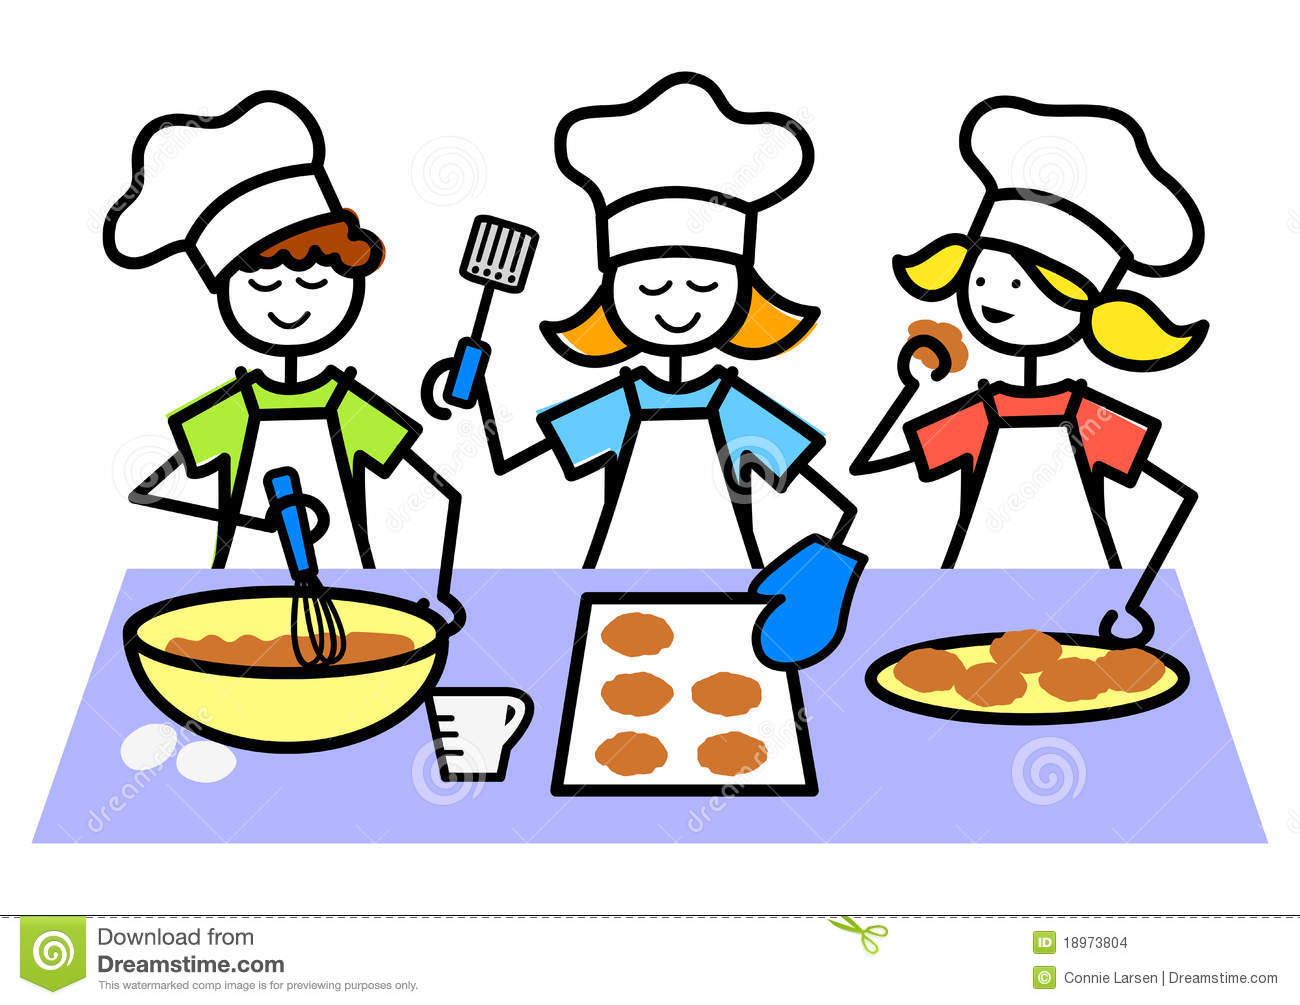 Cartoon Kids Baking Cookies Eps Stock Im-Cartoon Kids Baking Cookies Eps Stock Images Image 18973804-0